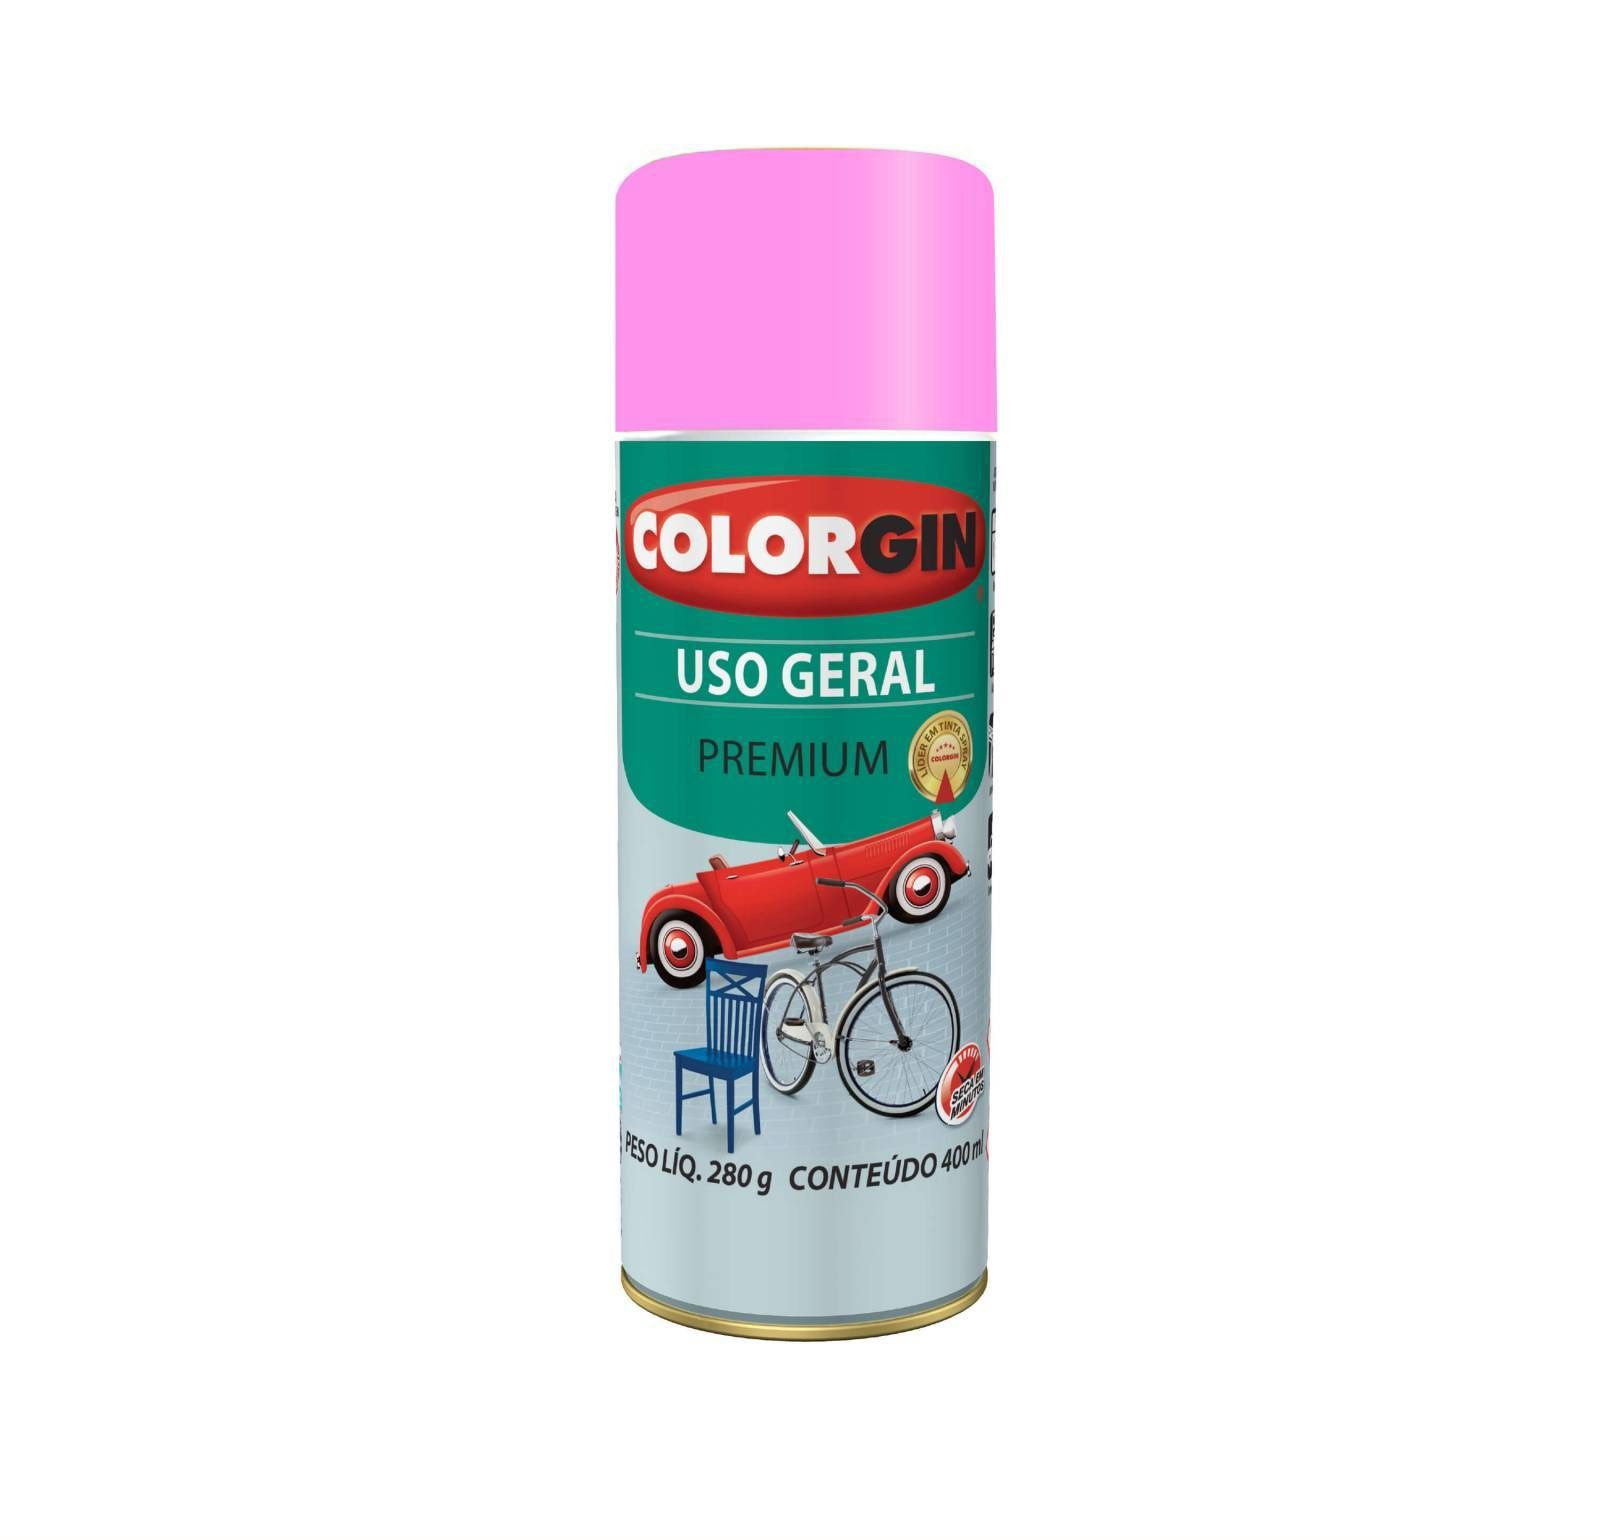 Spray 5606 Uso Geral Rosa Gbr Colorgin